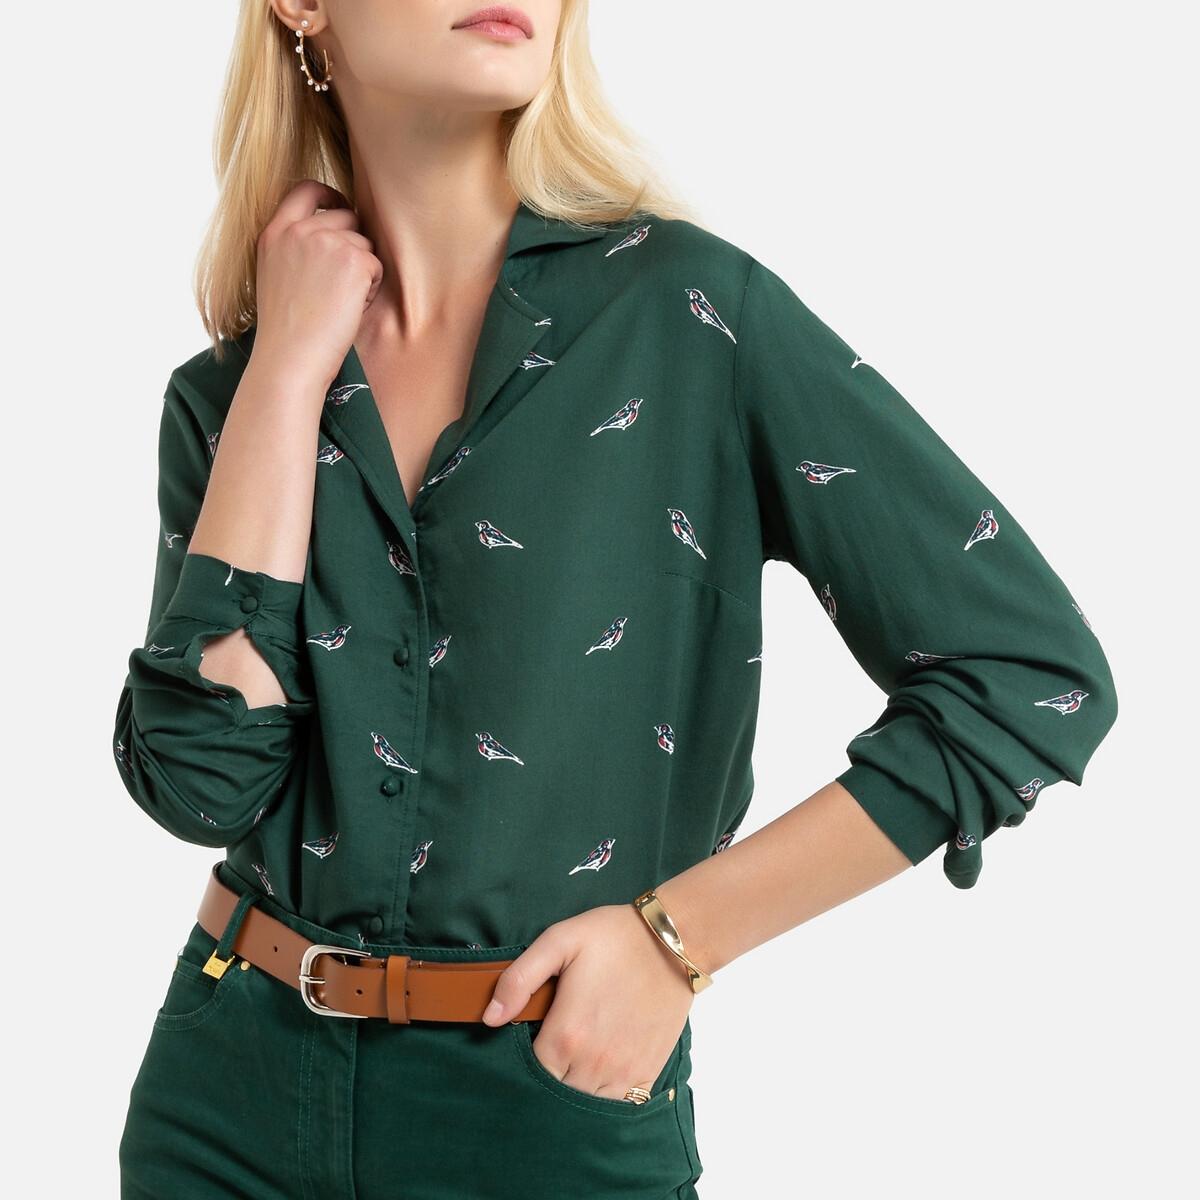 Image of Animal Print Shirt with Long Sleeves